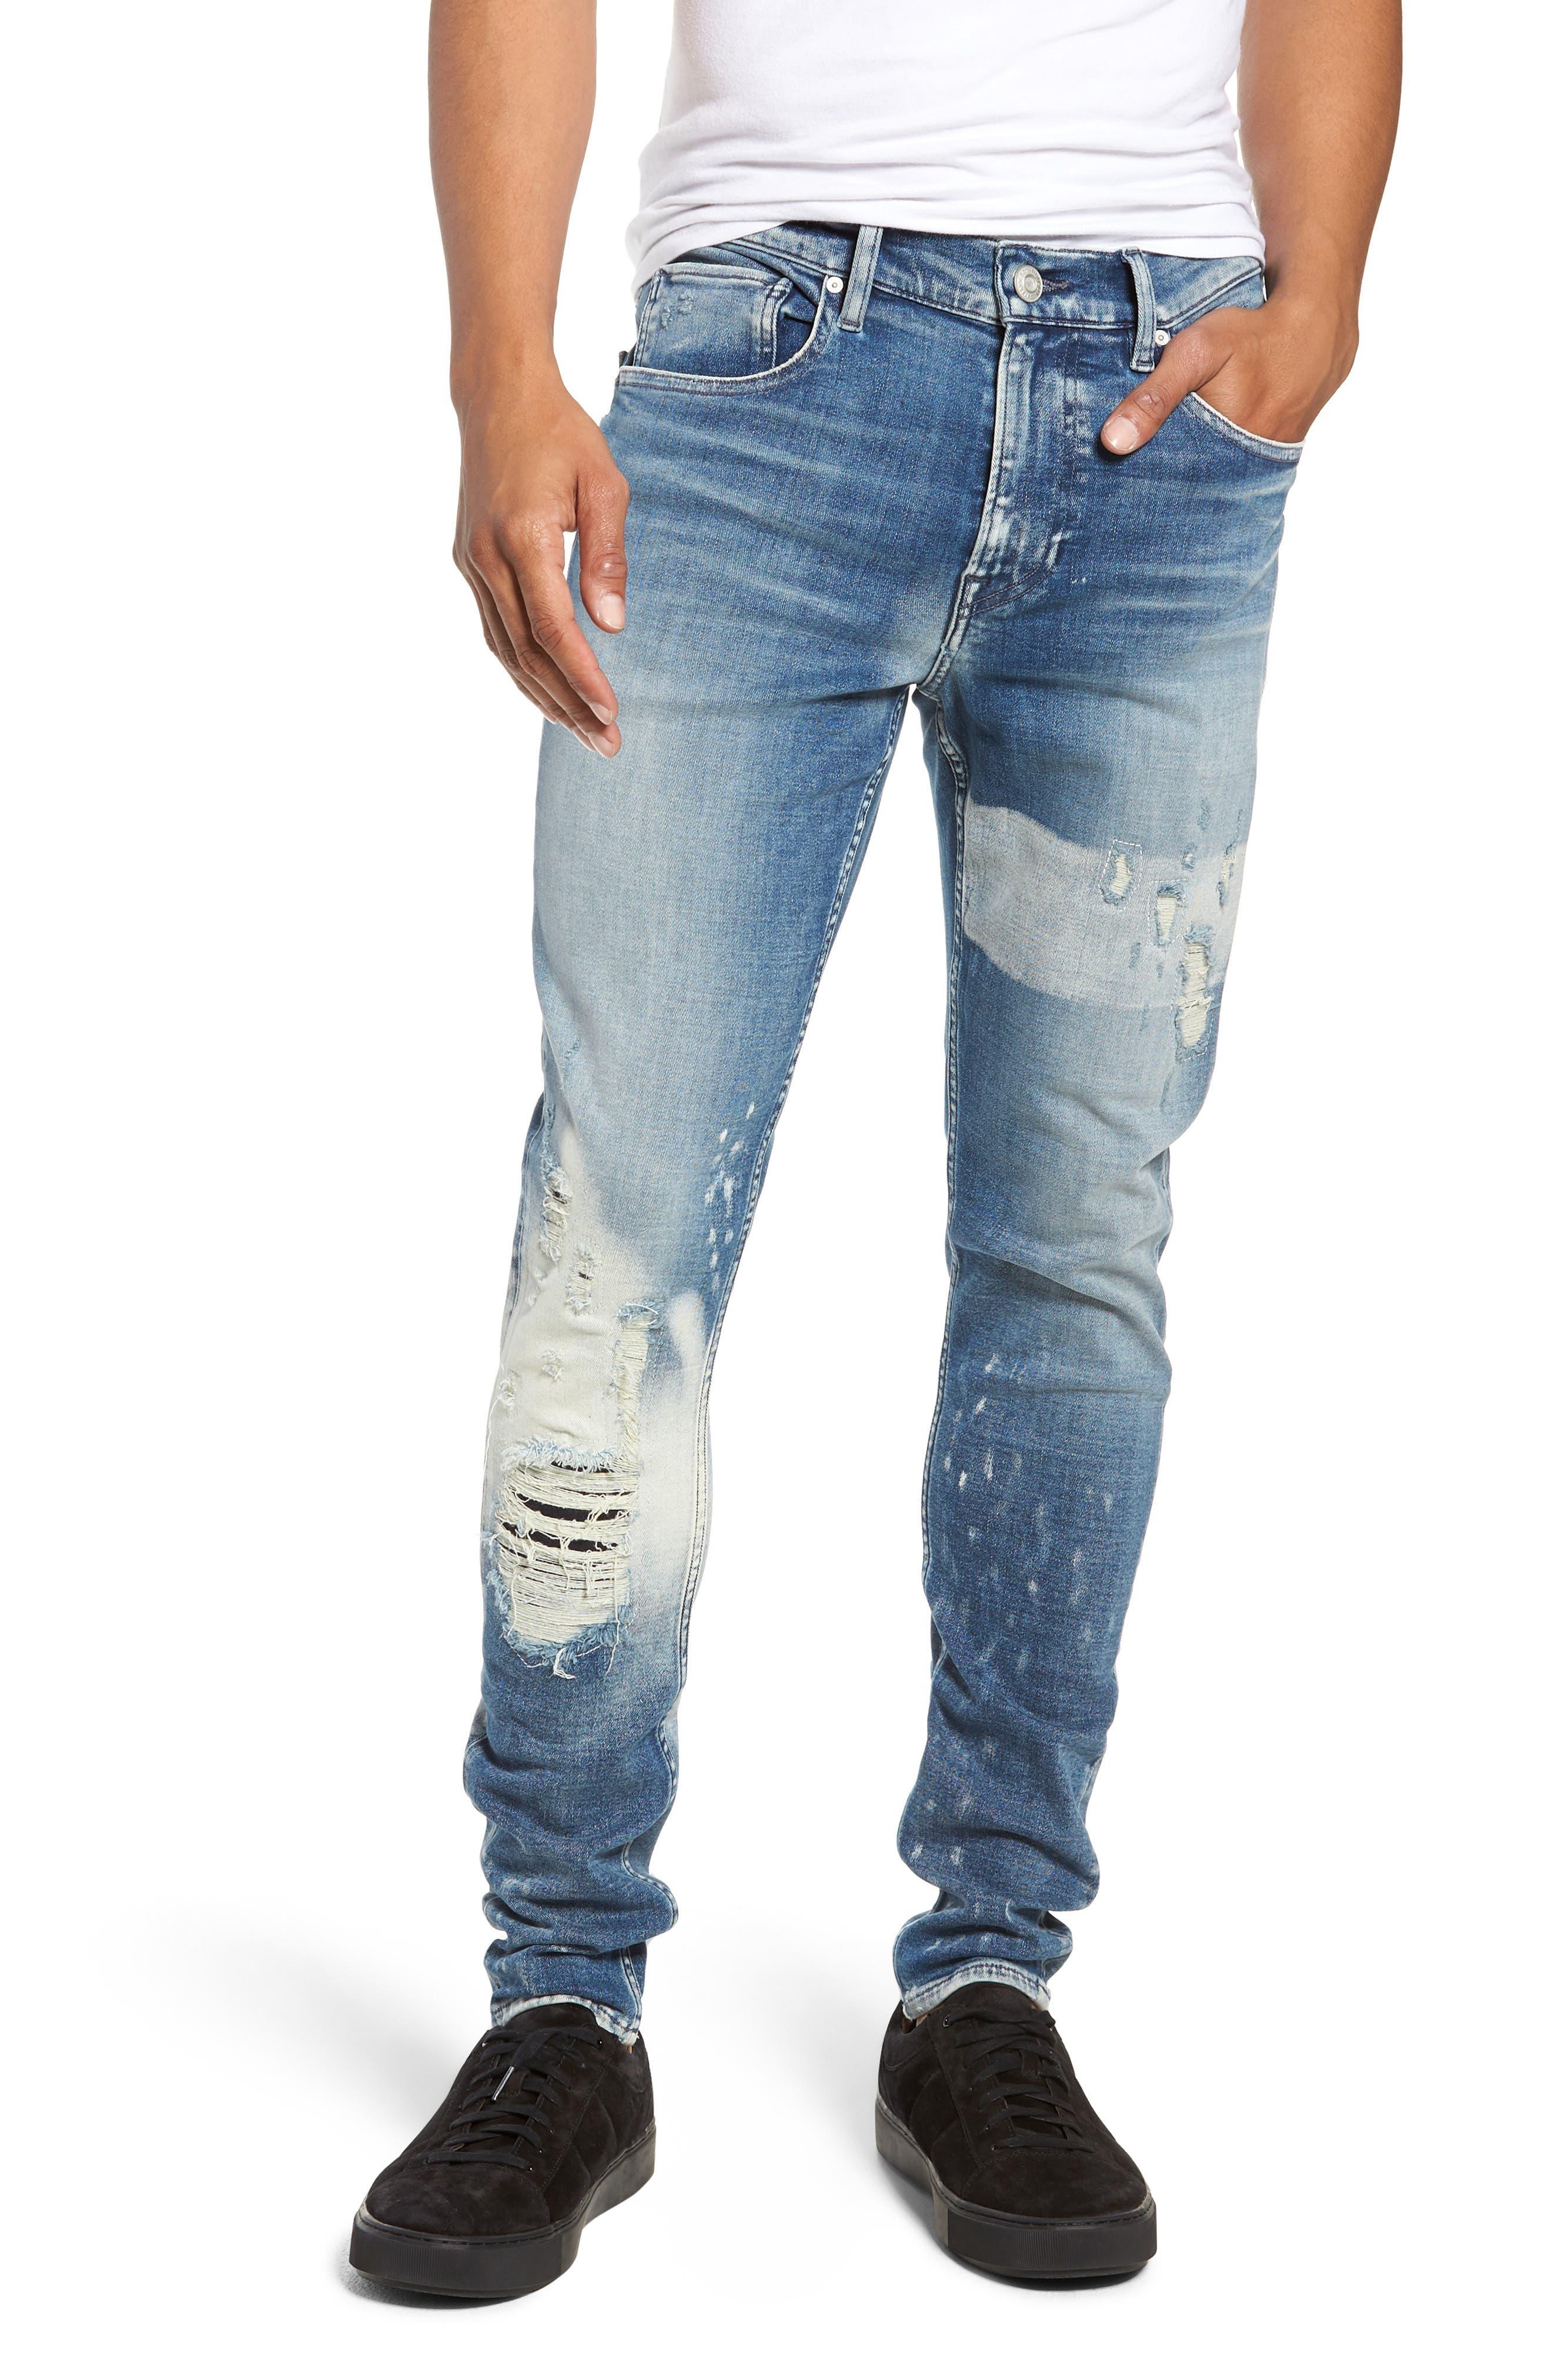 Zack Skinny Fit Jeans,                             Main thumbnail 1, color,                             MCNAB